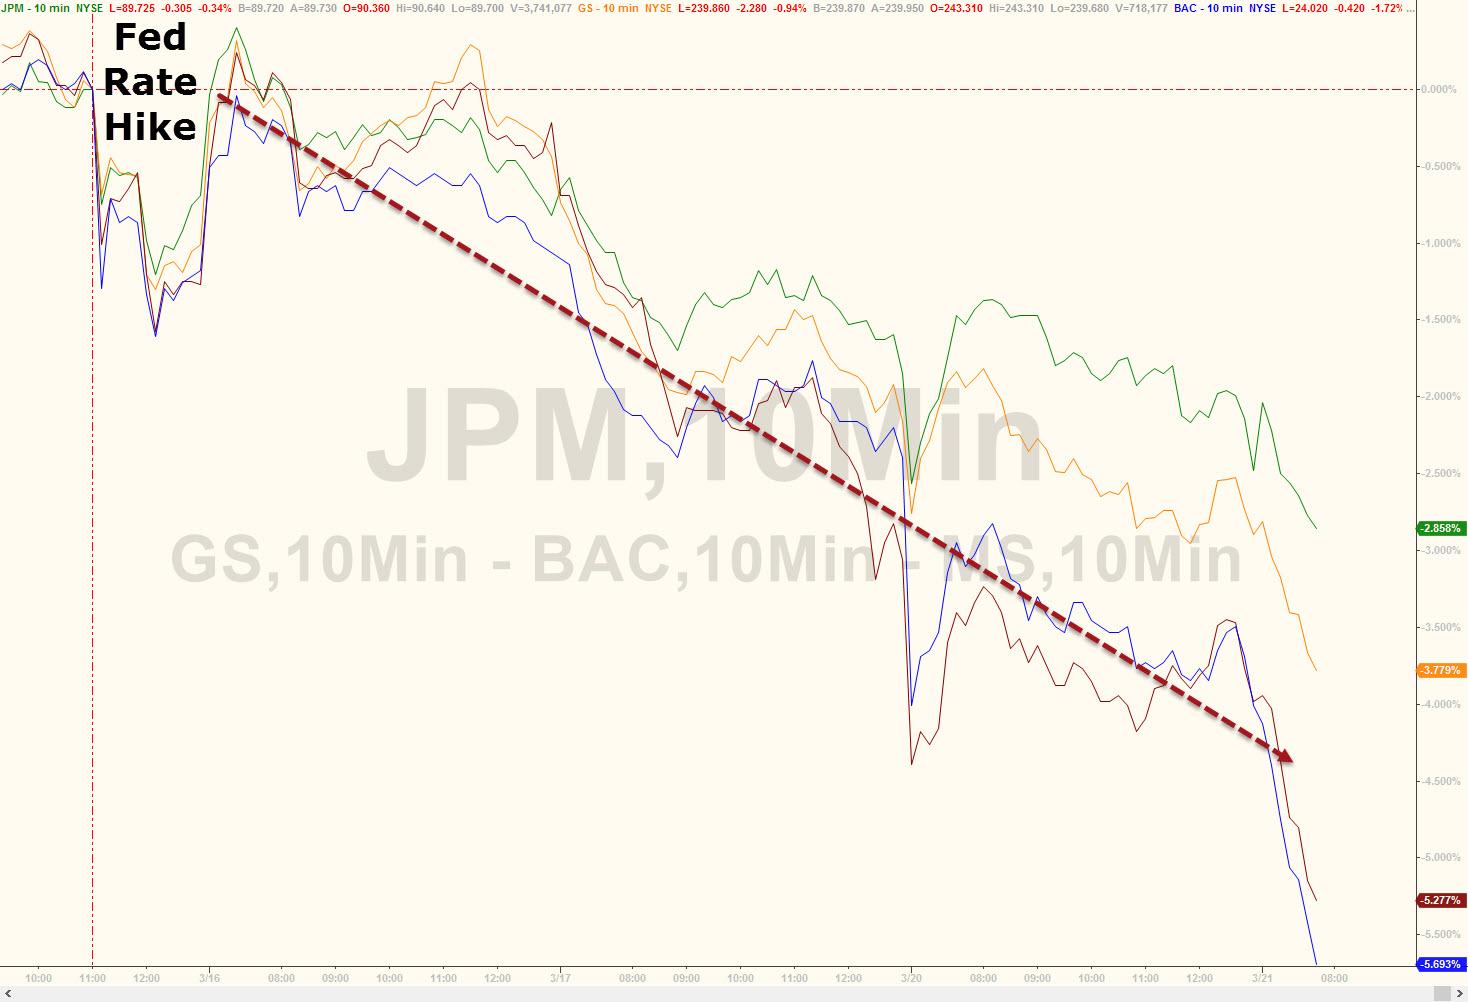 http://icebergfinanza.finanza.com/files/2017/03/20170321_stocks1.jpg